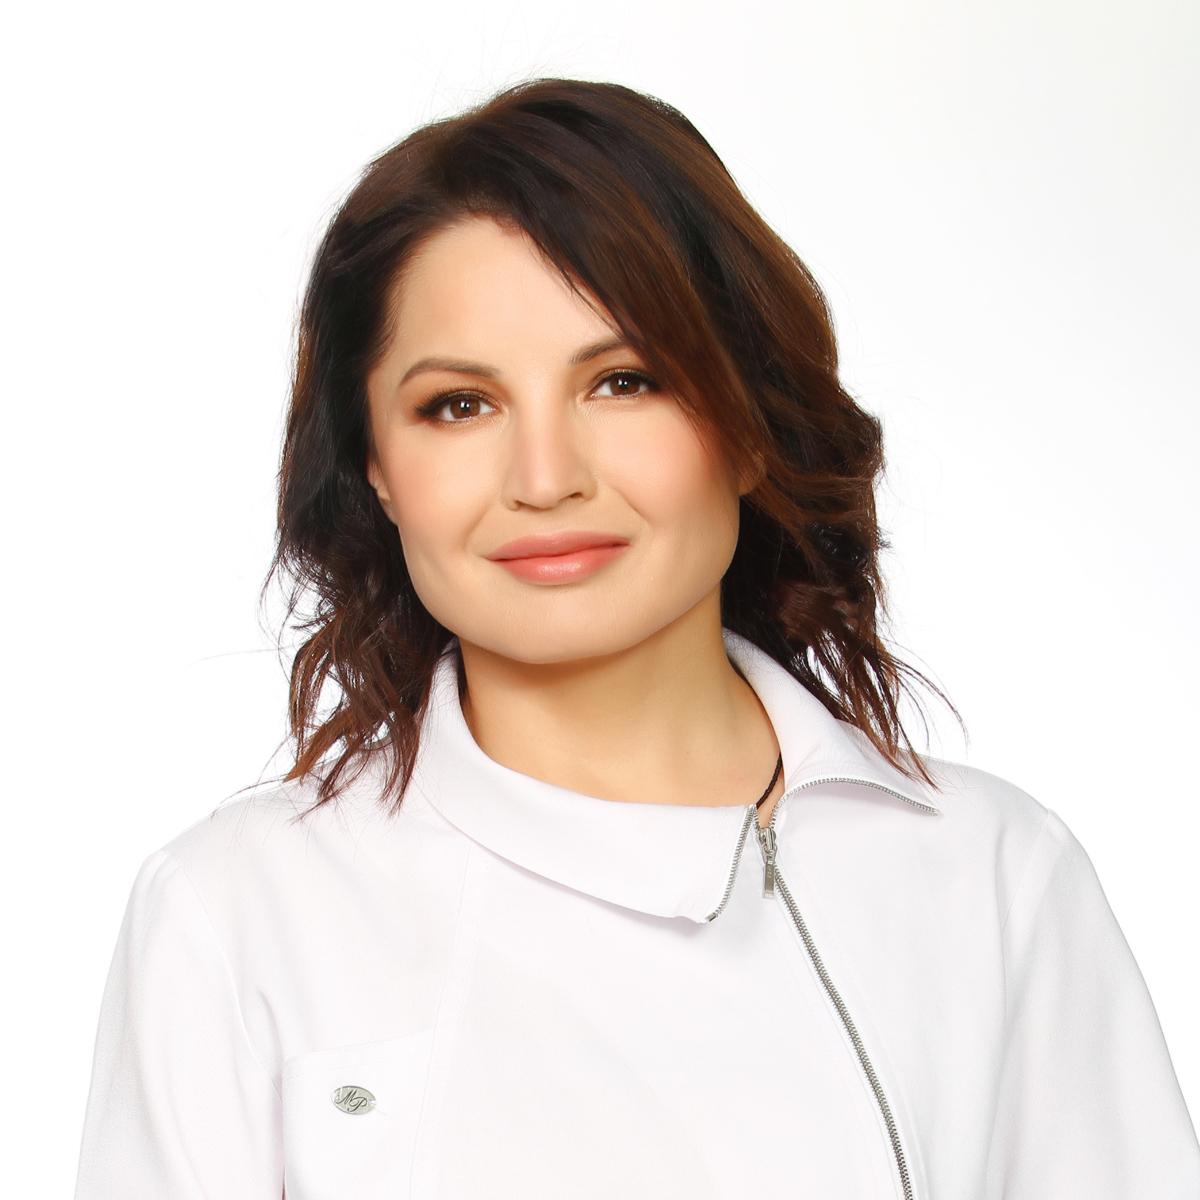 Камалова Альфия Габдуллаевна